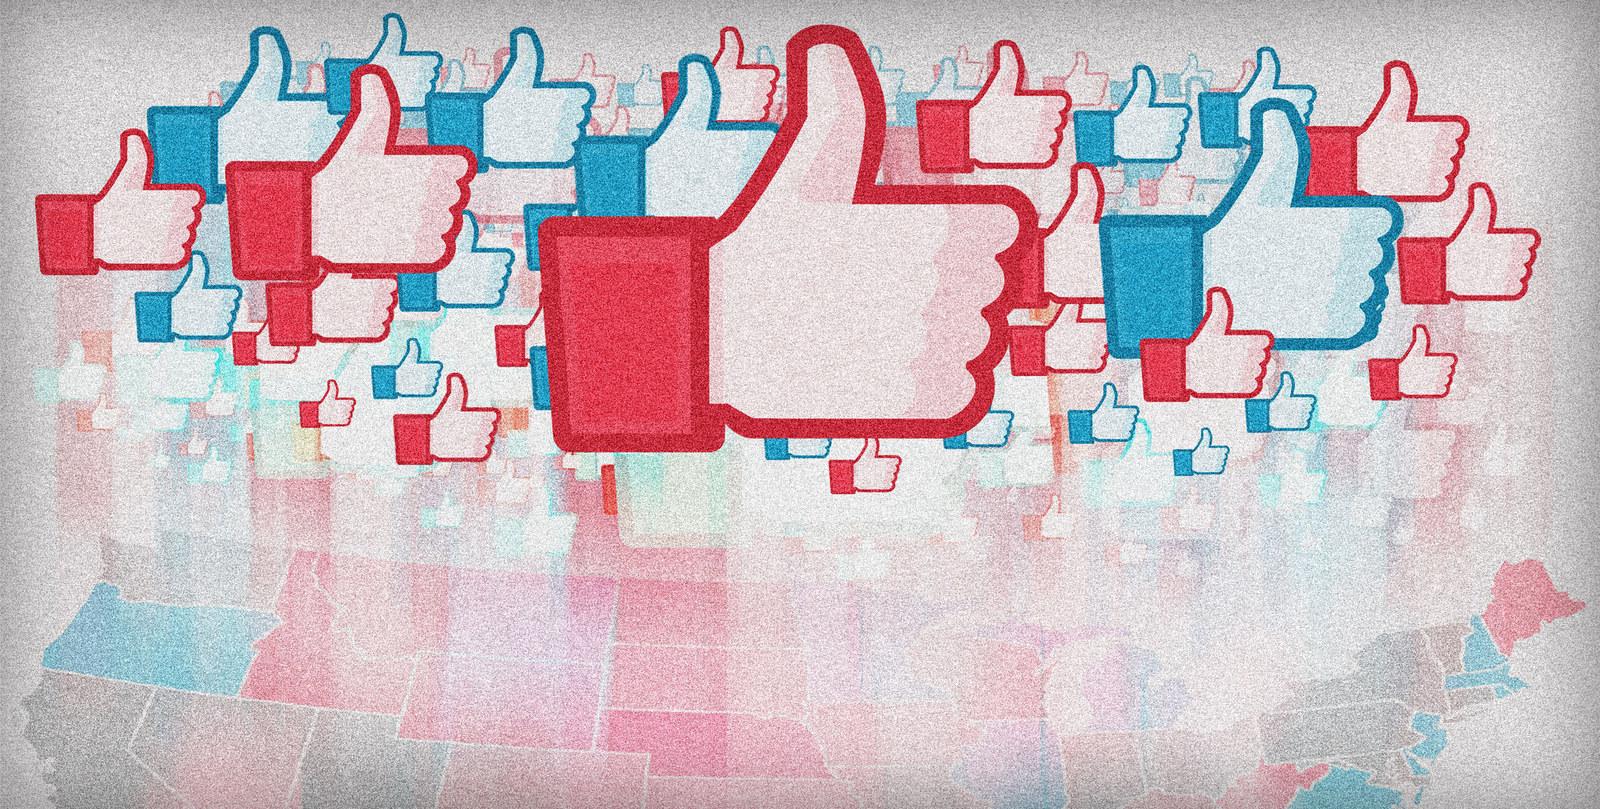 The Facebook Election